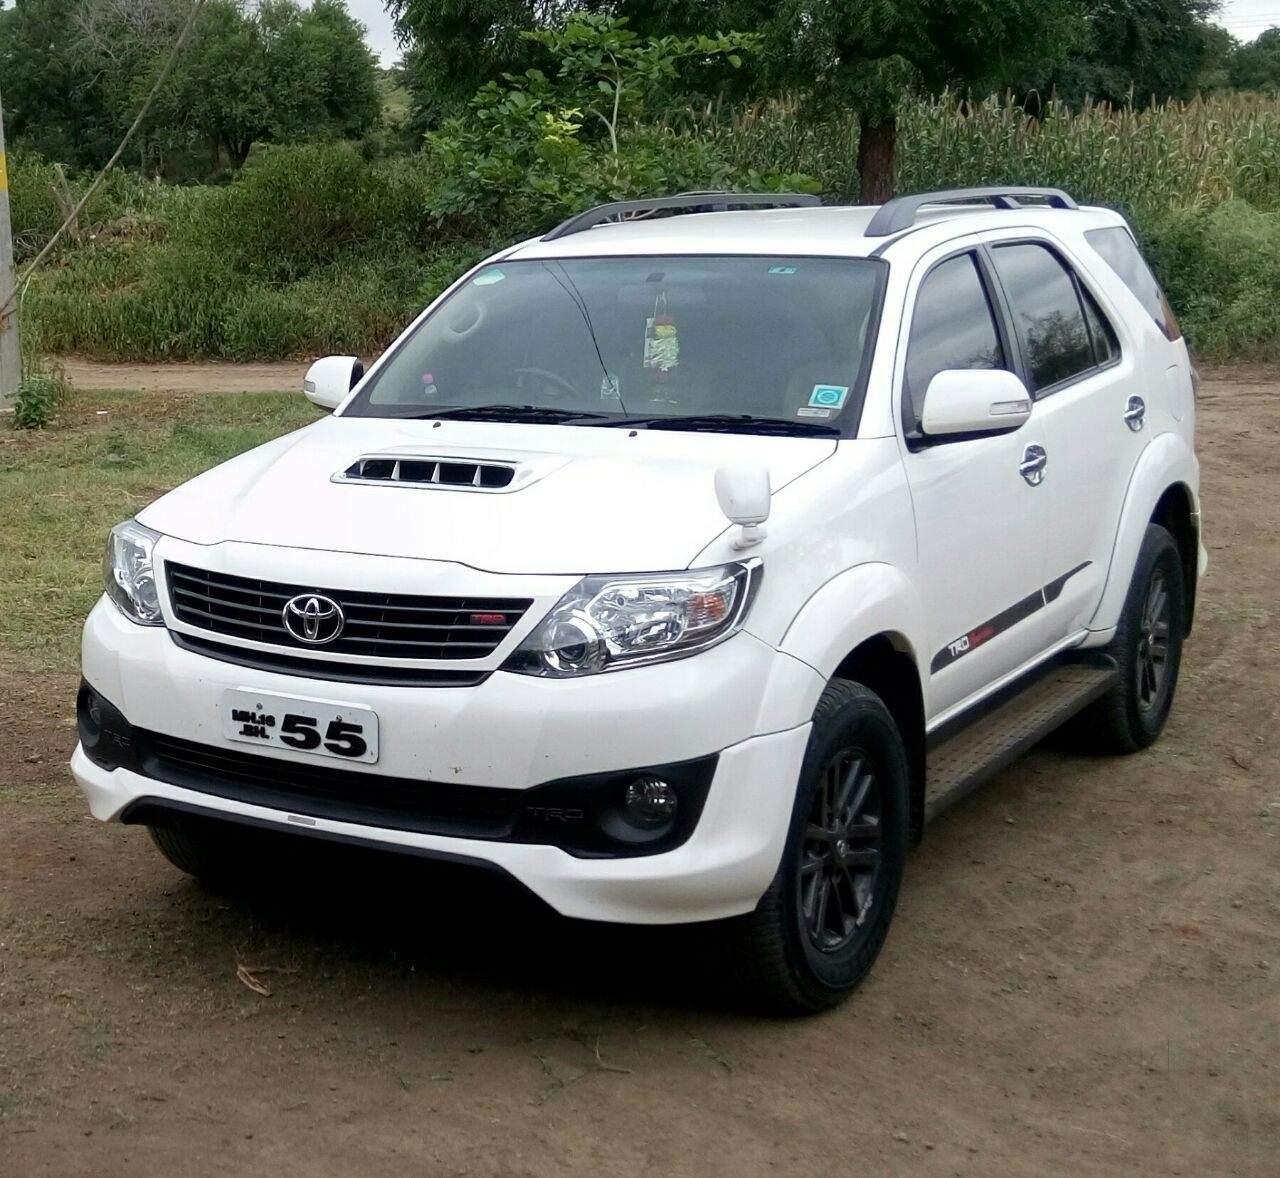 Sai Shradha Motors Wakad Second Hand Car Dealers In Pune Justdial